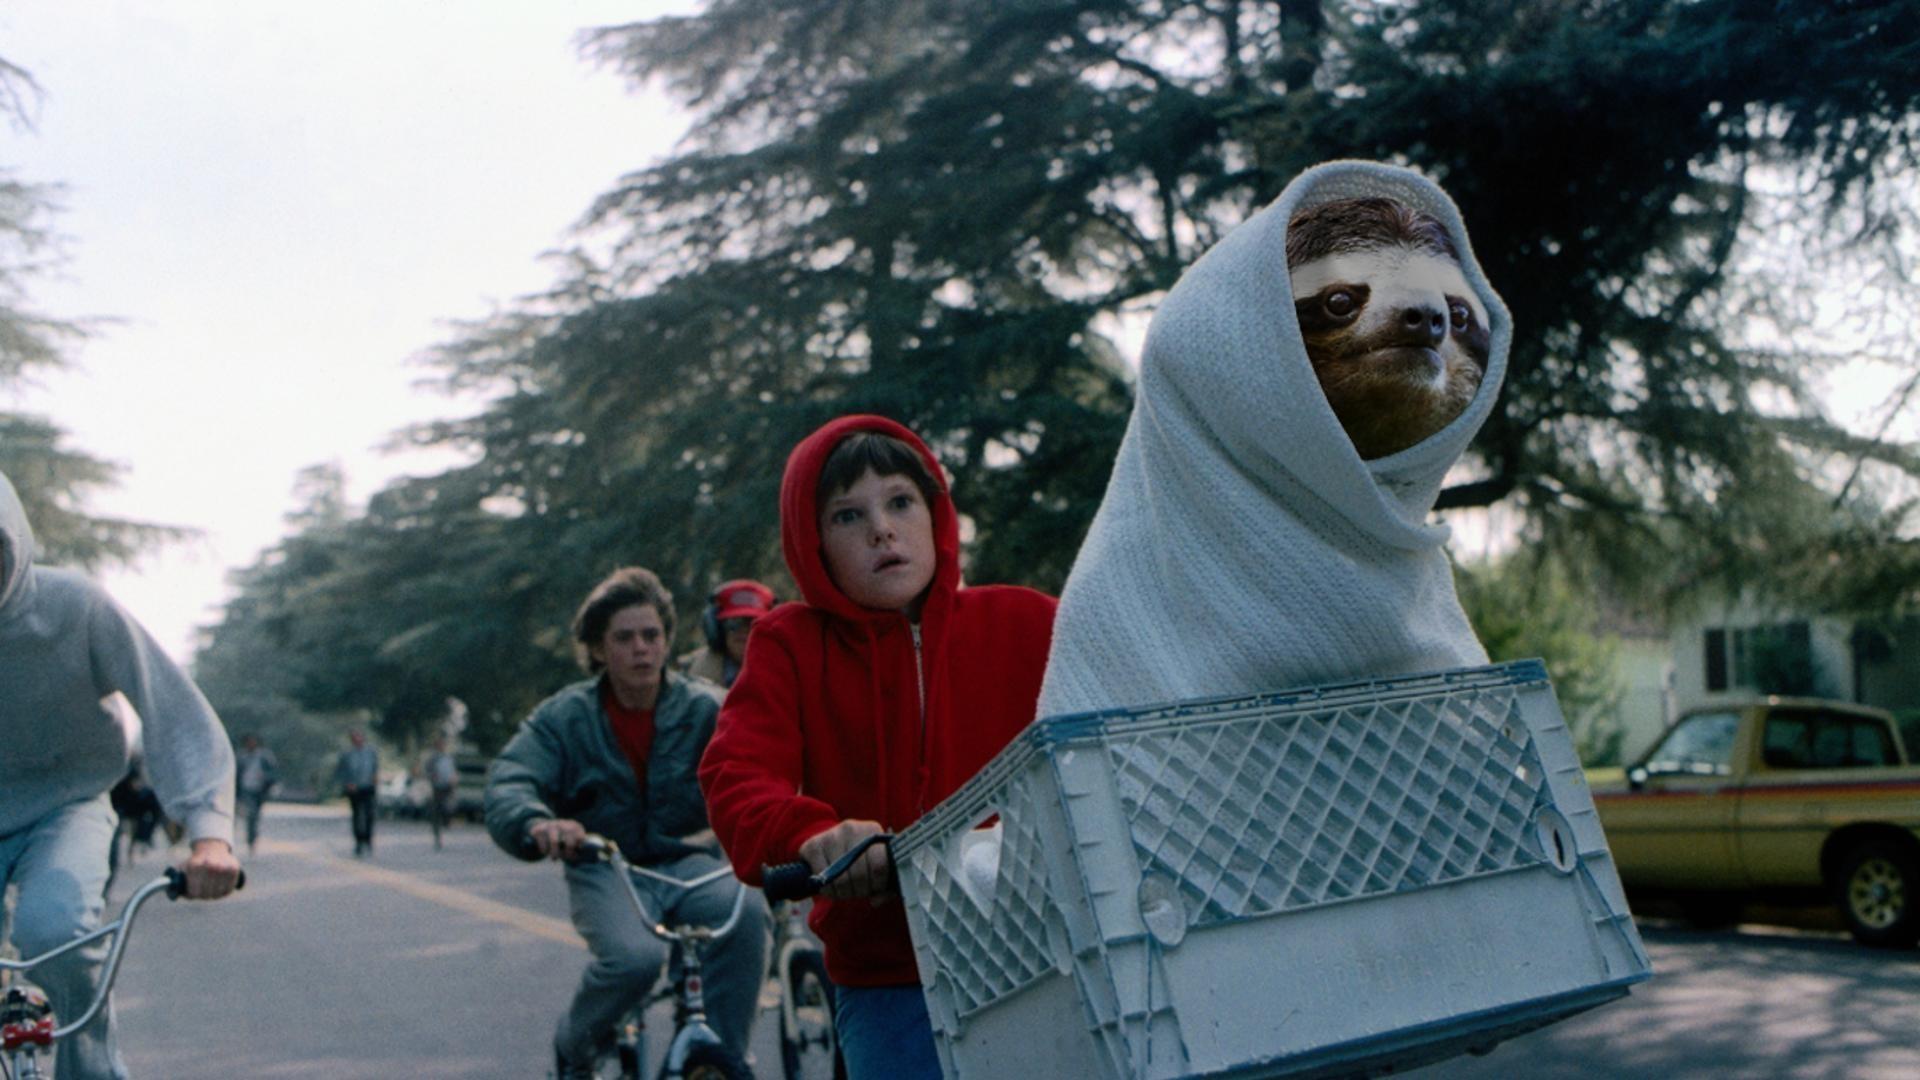 E.T. sloth wallpaper 920×1080